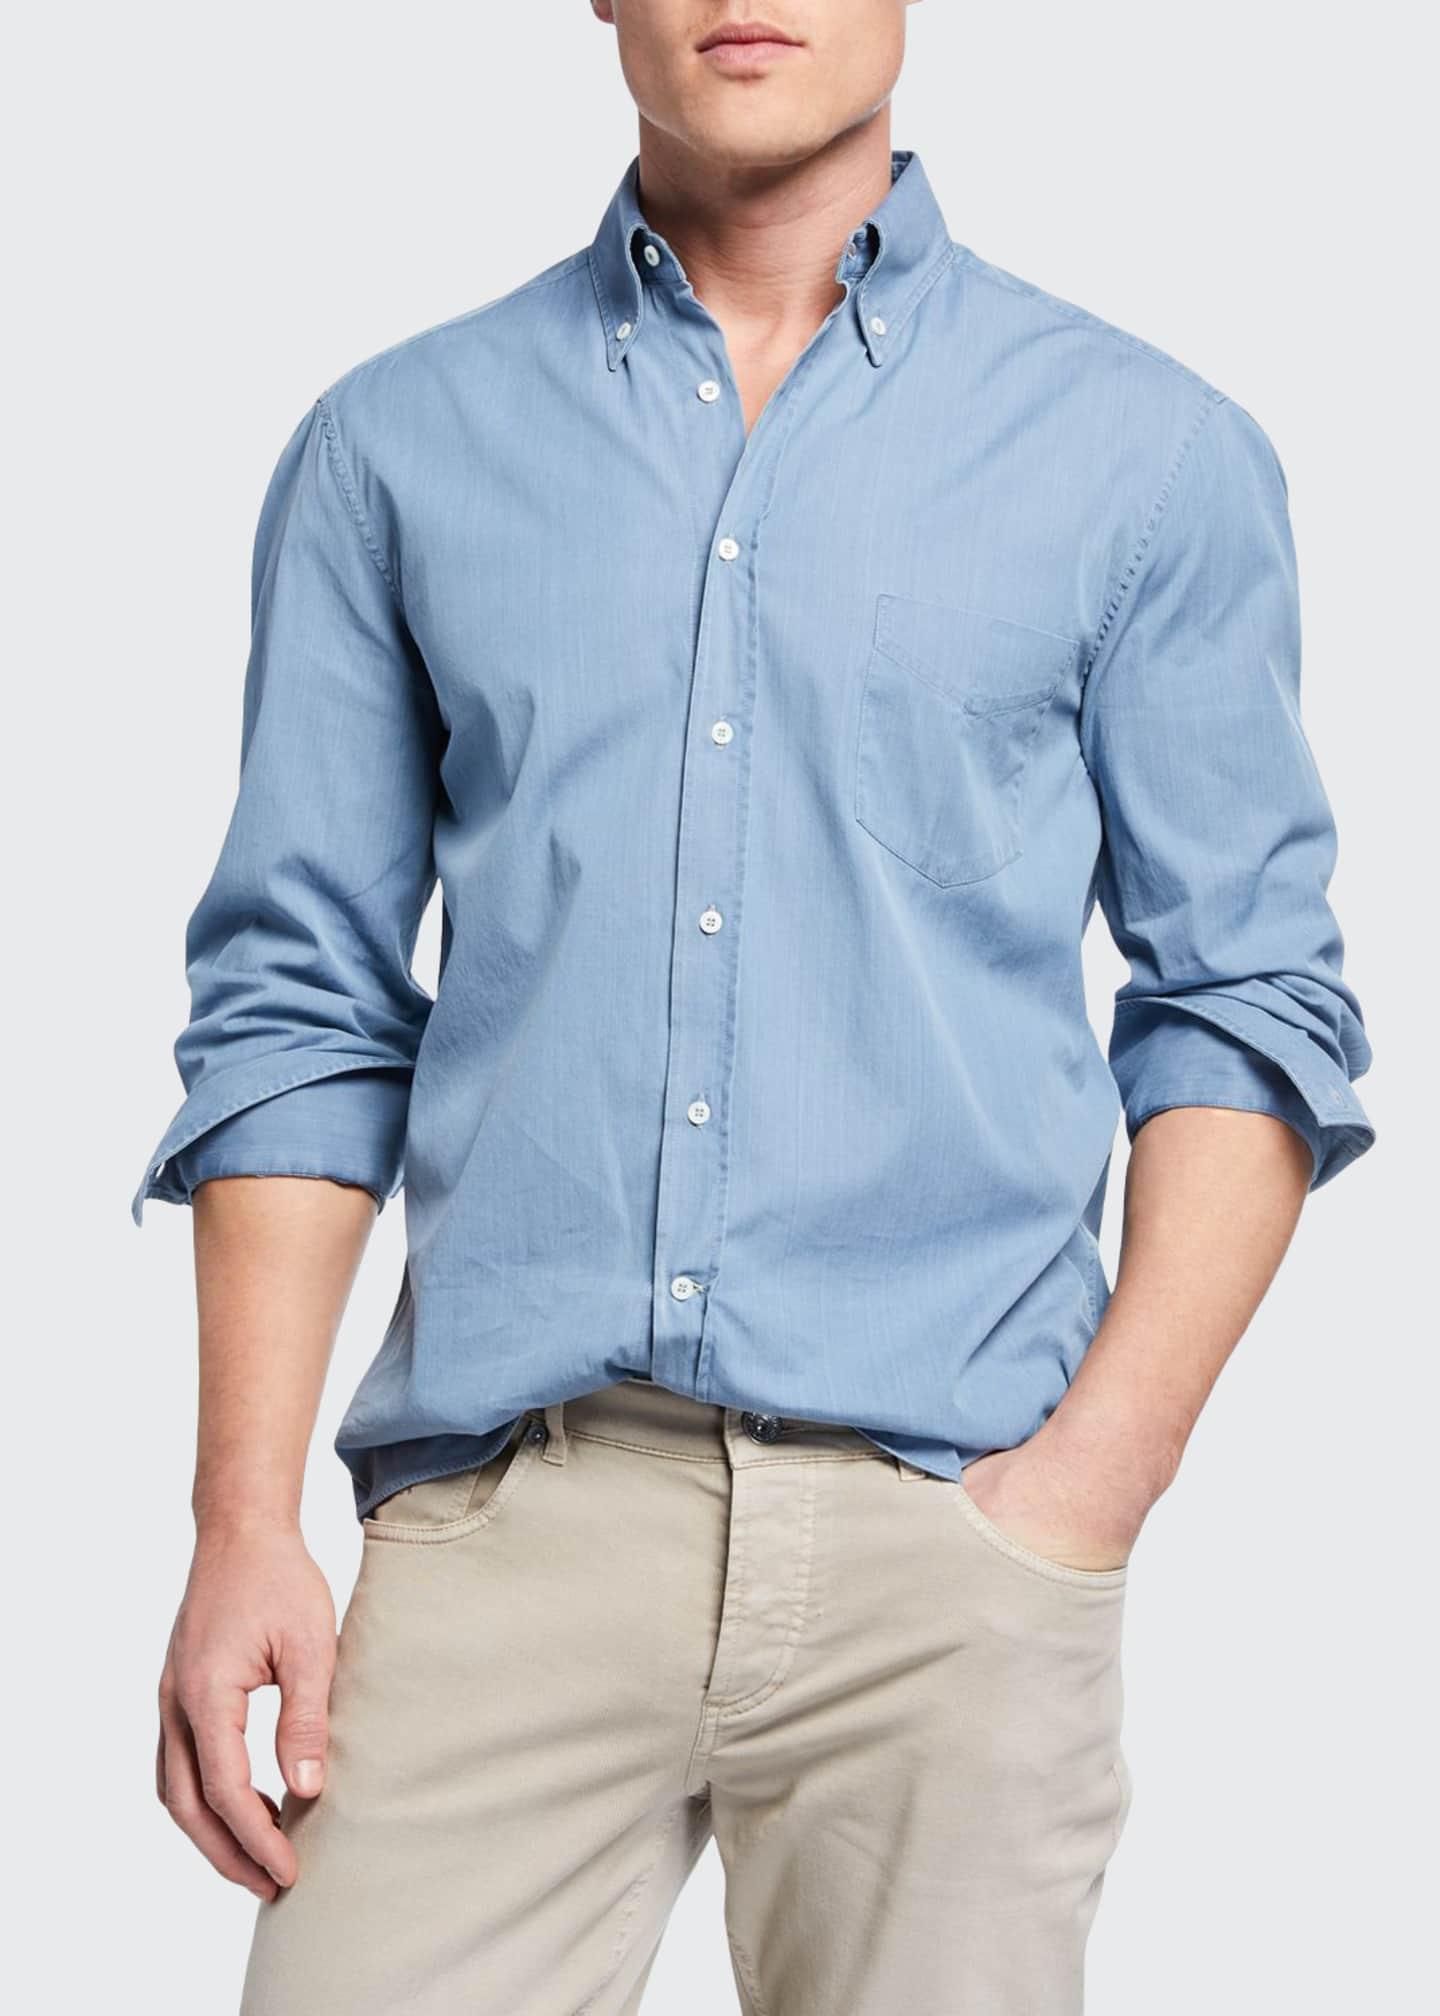 Brunello Cucinelli Men's Basic Fit Chambray Sport Shirt